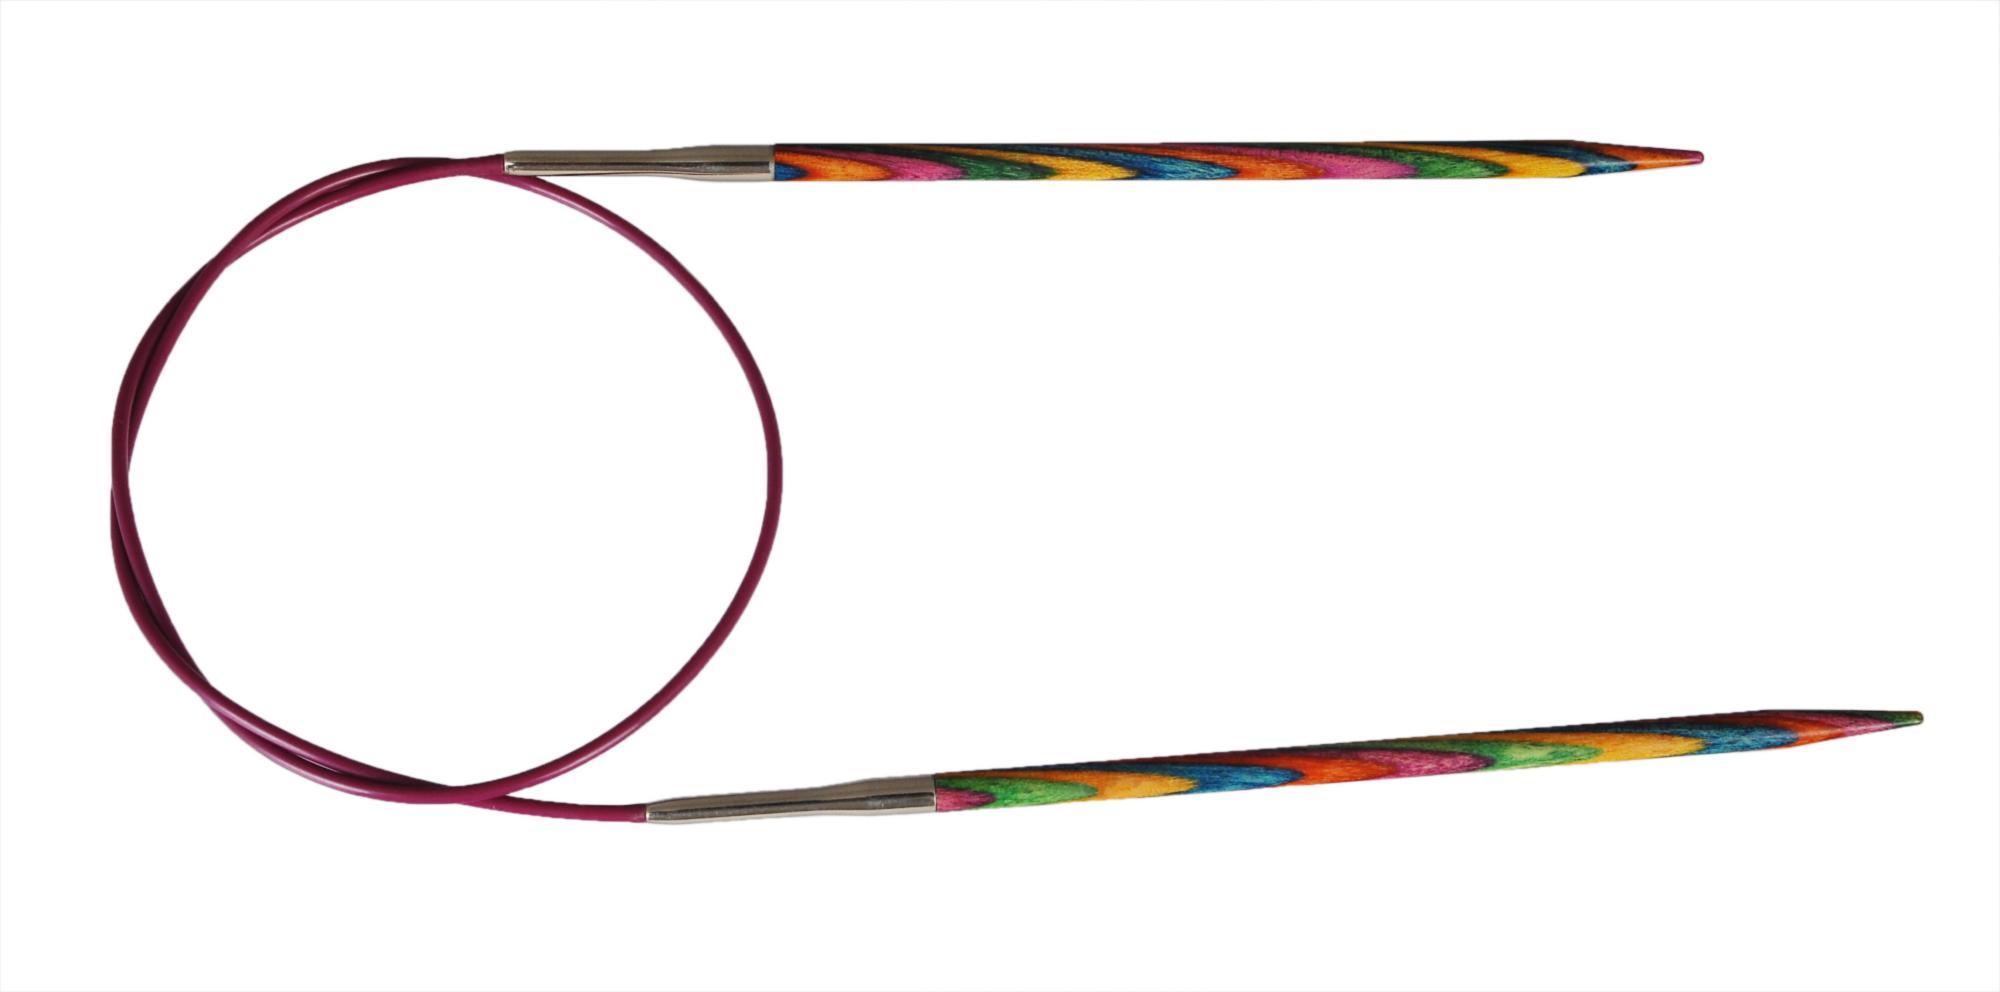 Спицы круговые 120 см Symfonie Wood KnitPro, 21376, 10.00 мм